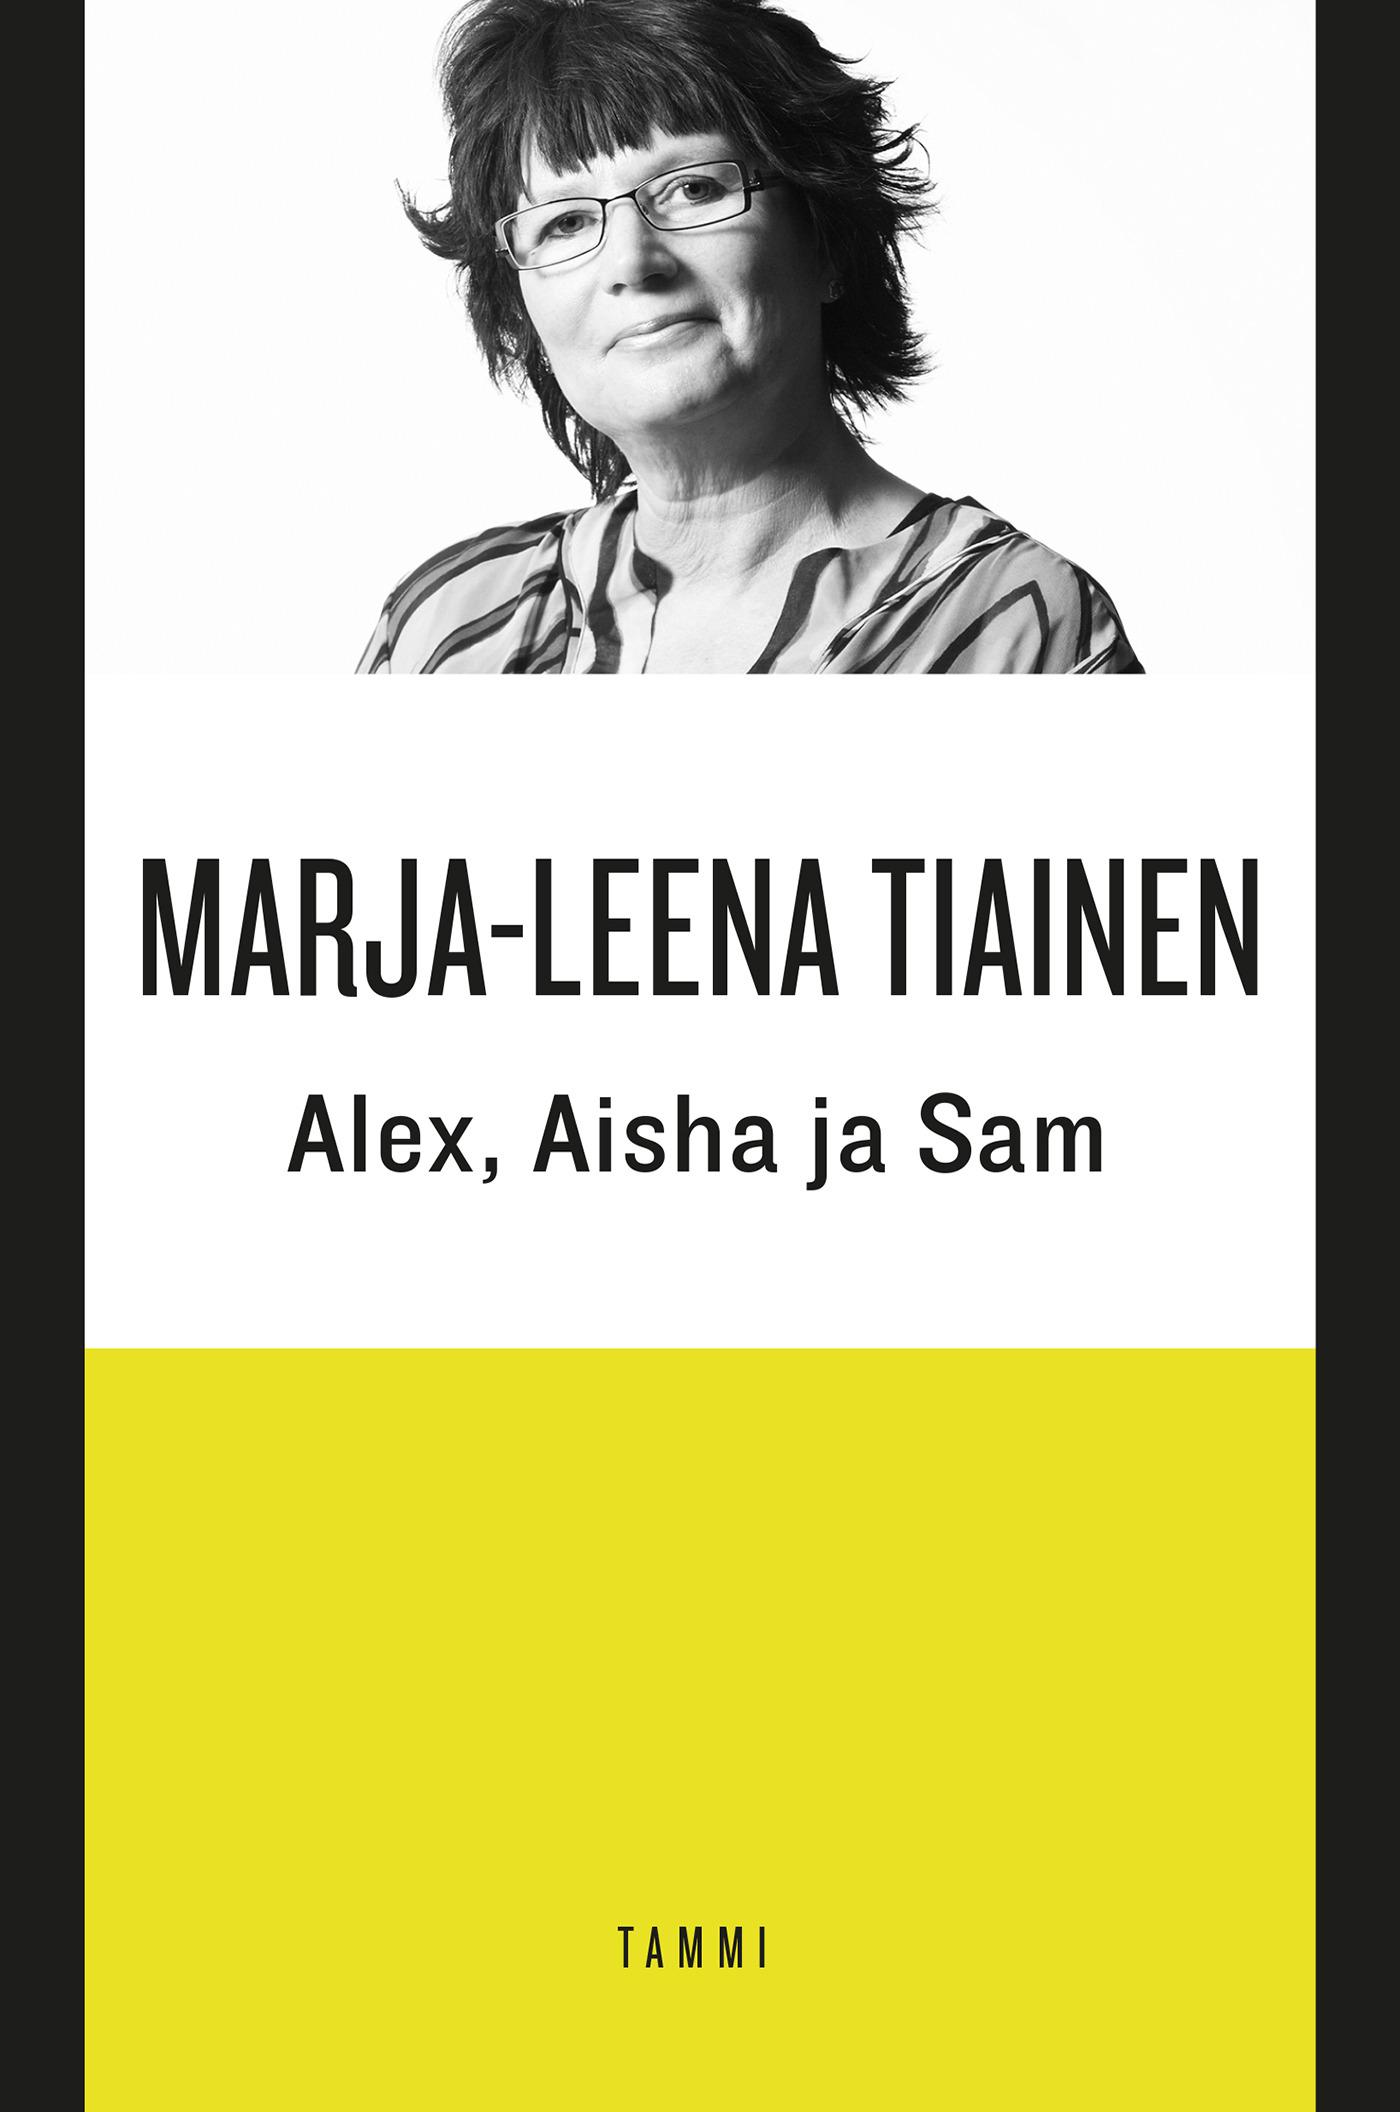 Tiainen, Marja-Leena - Alex, Aisha ja Sam, e-kirja